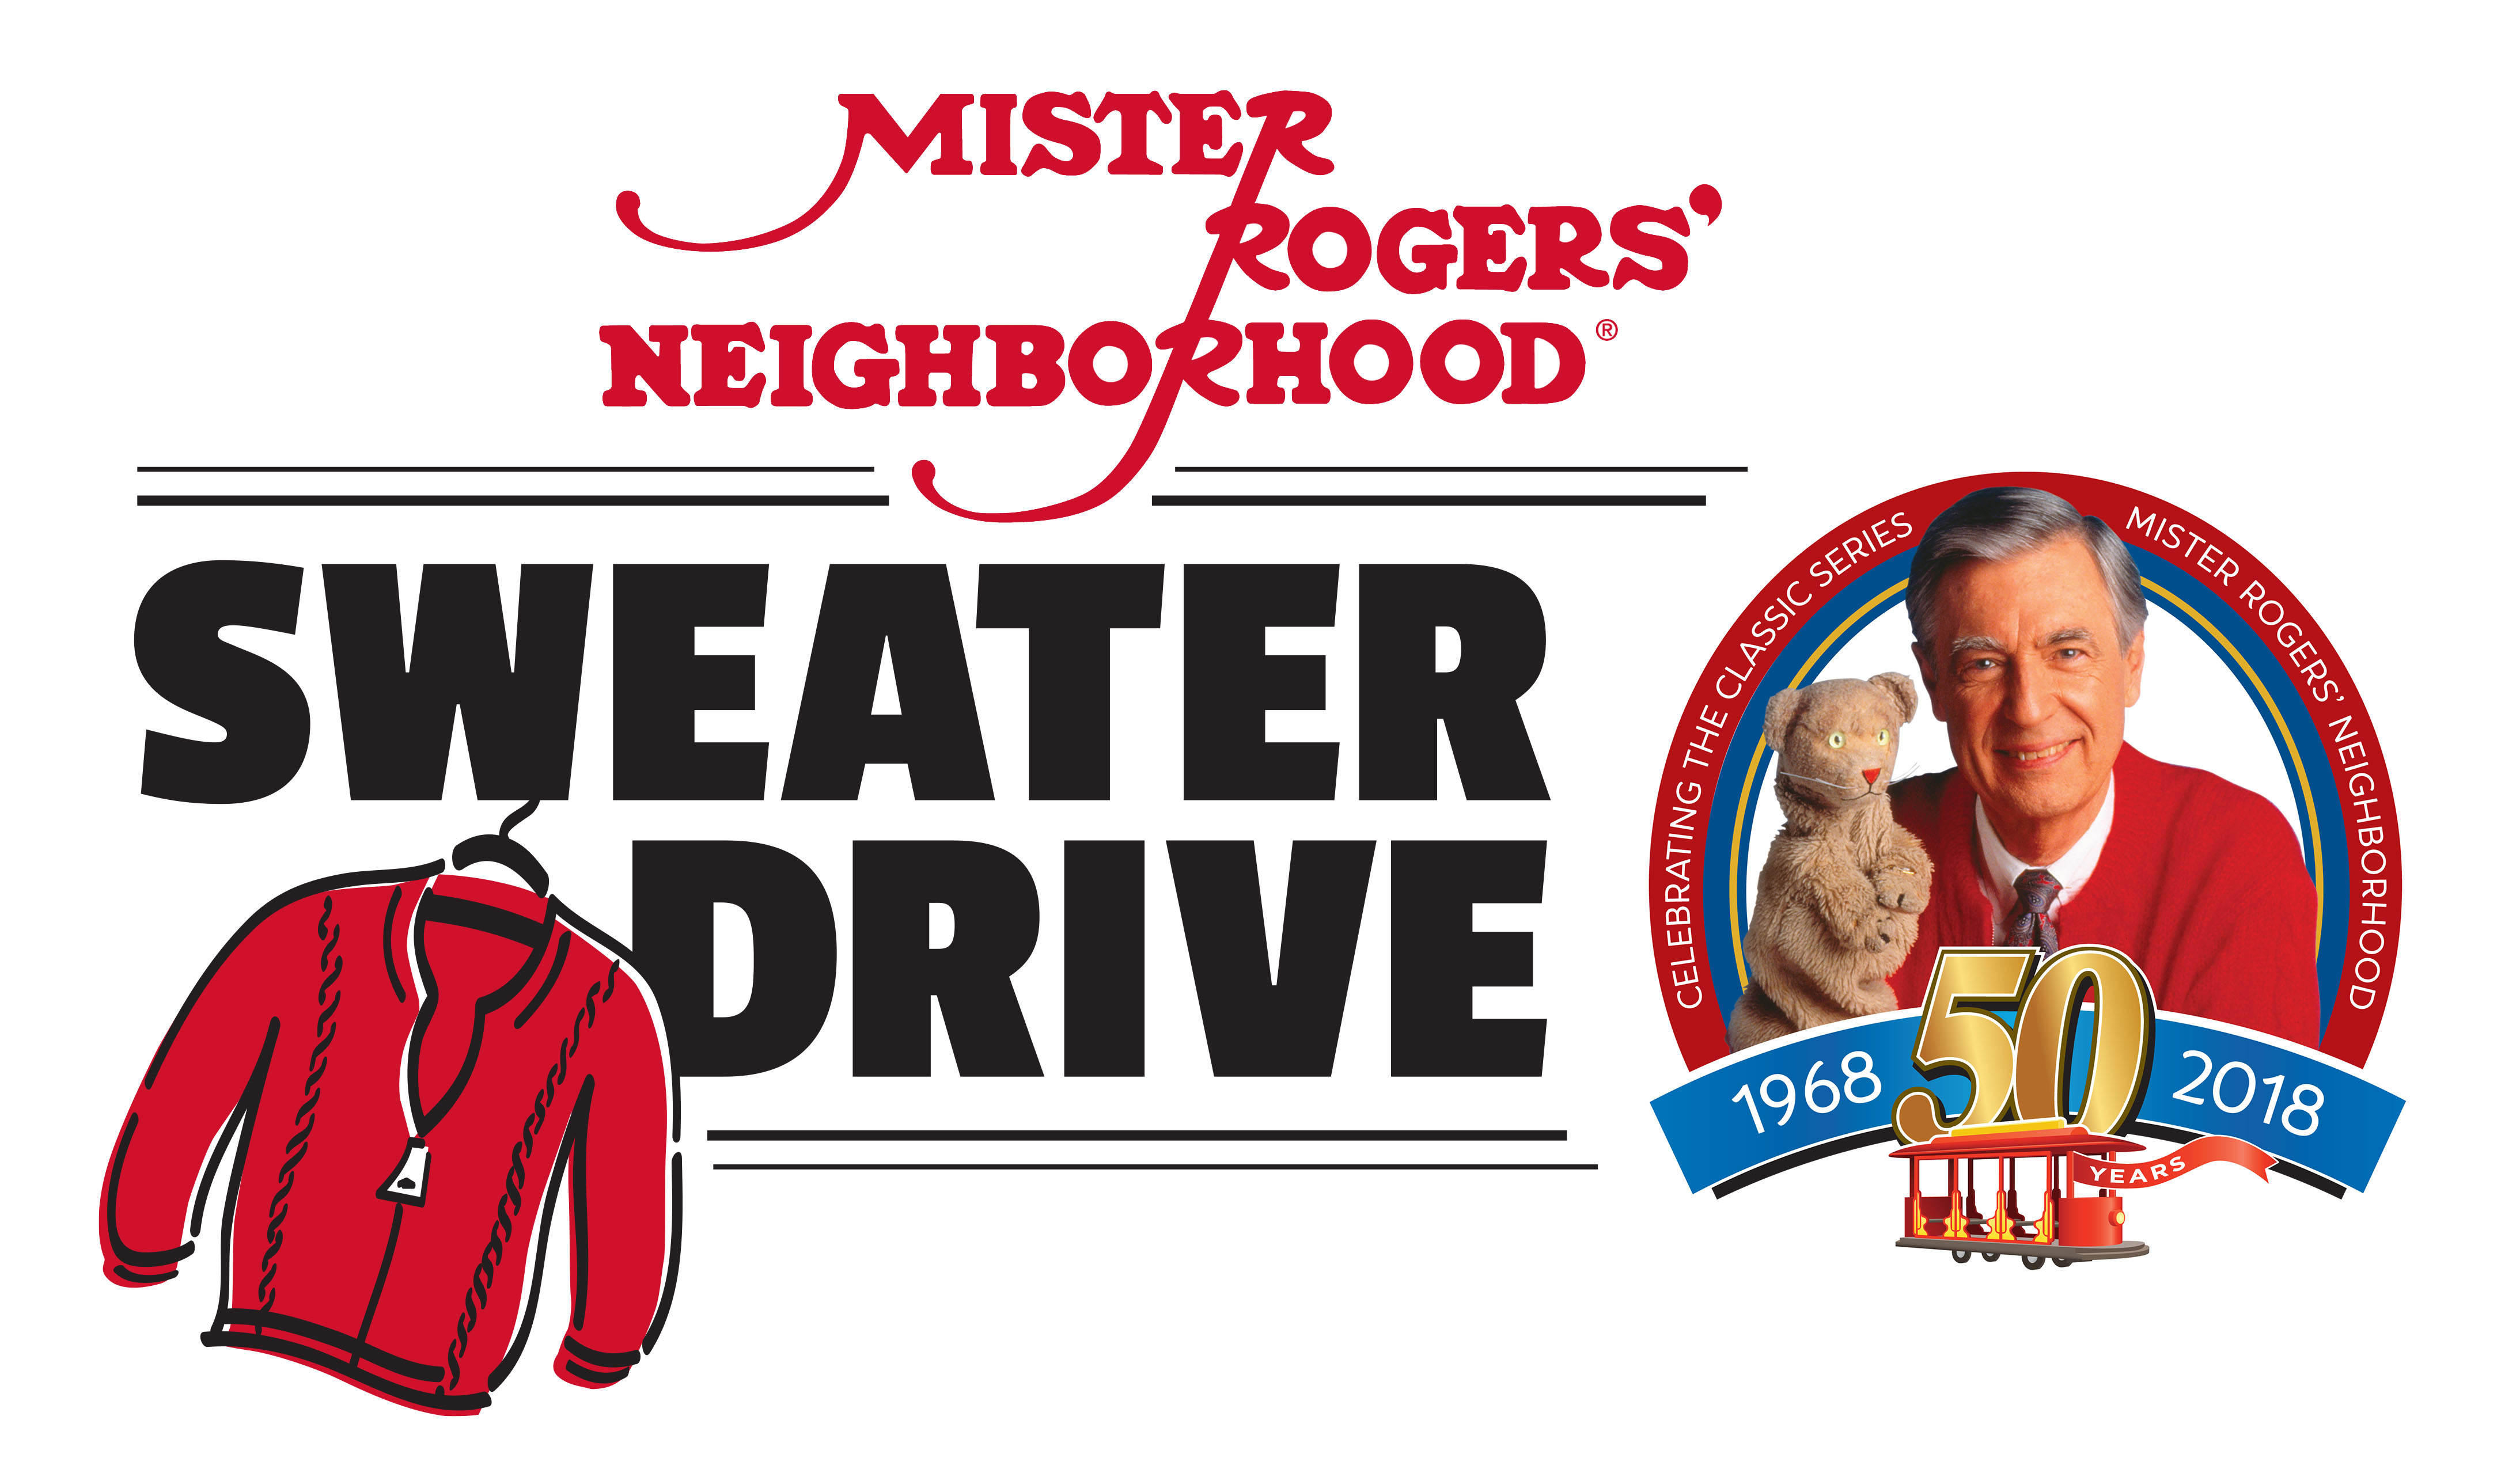 Mister Rogers' Neighborhood Sweater Drive